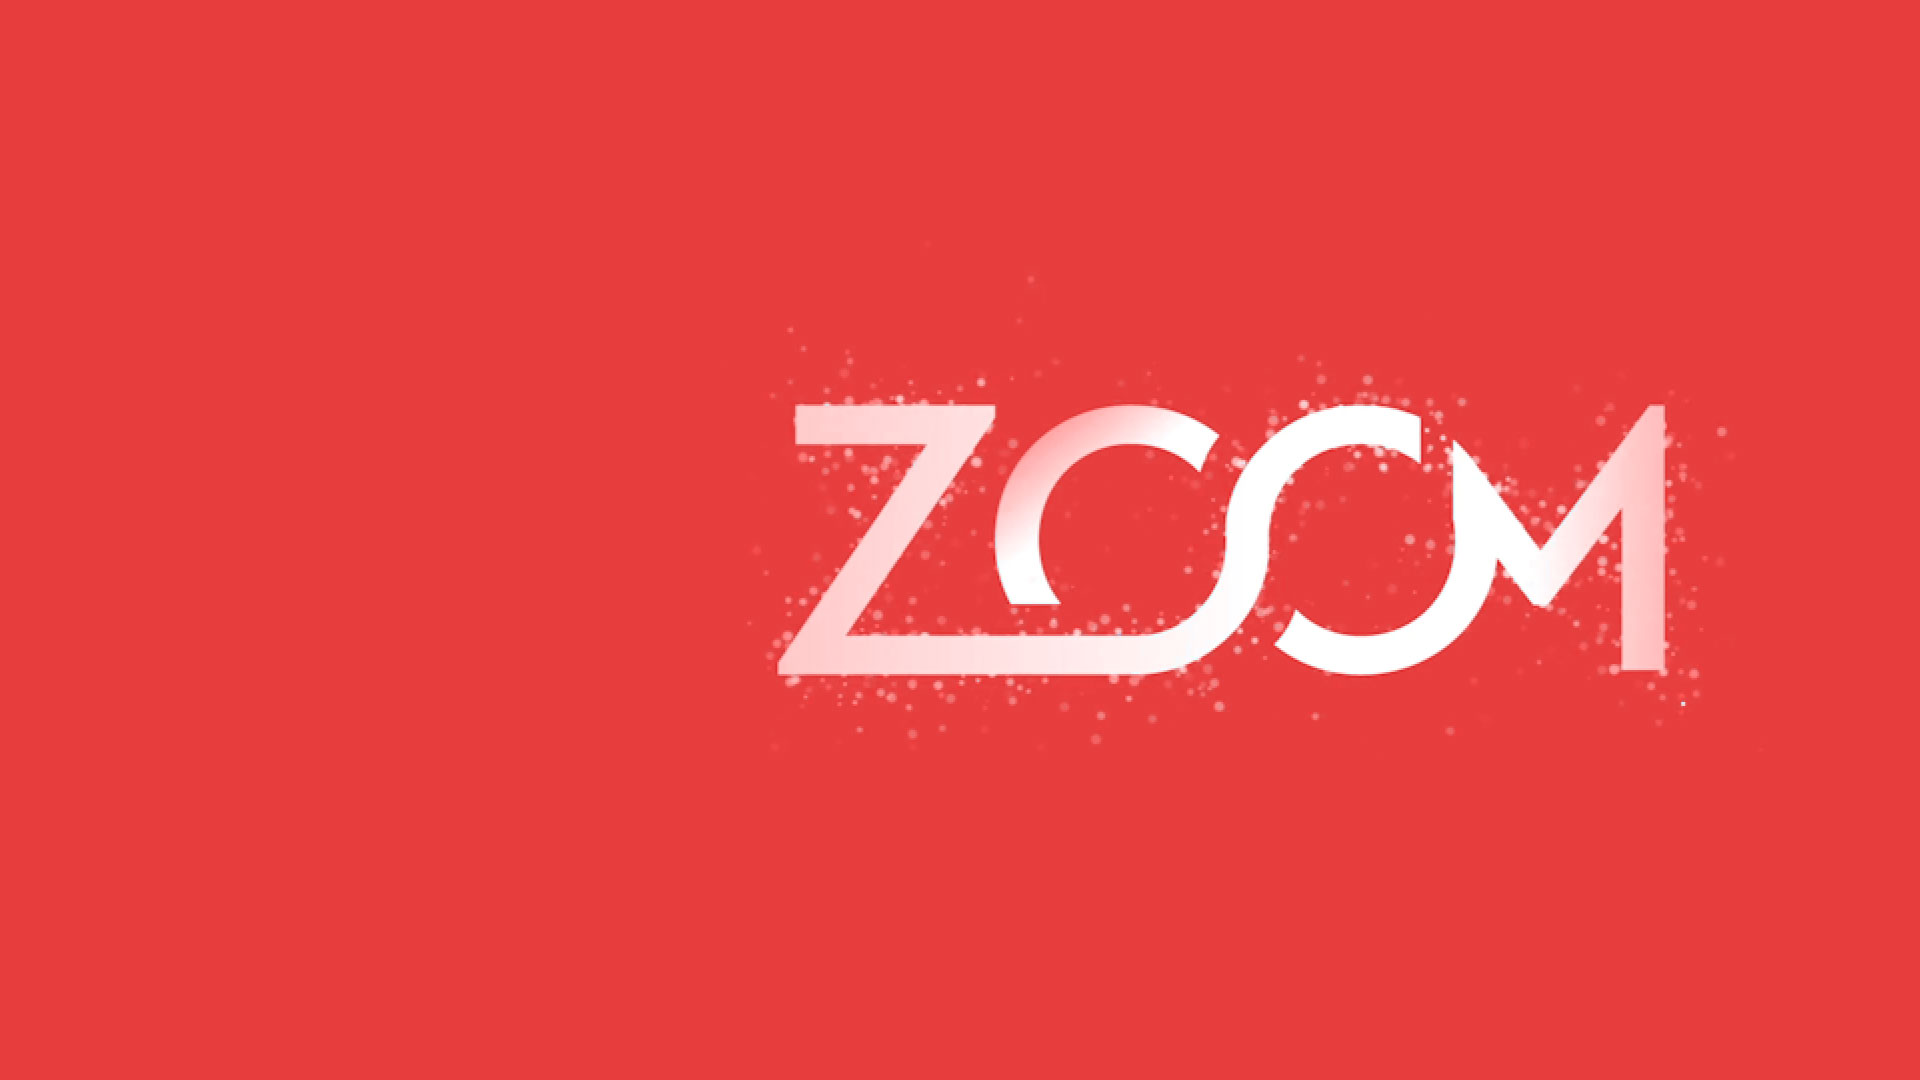 Rectangle 3 - Zoom